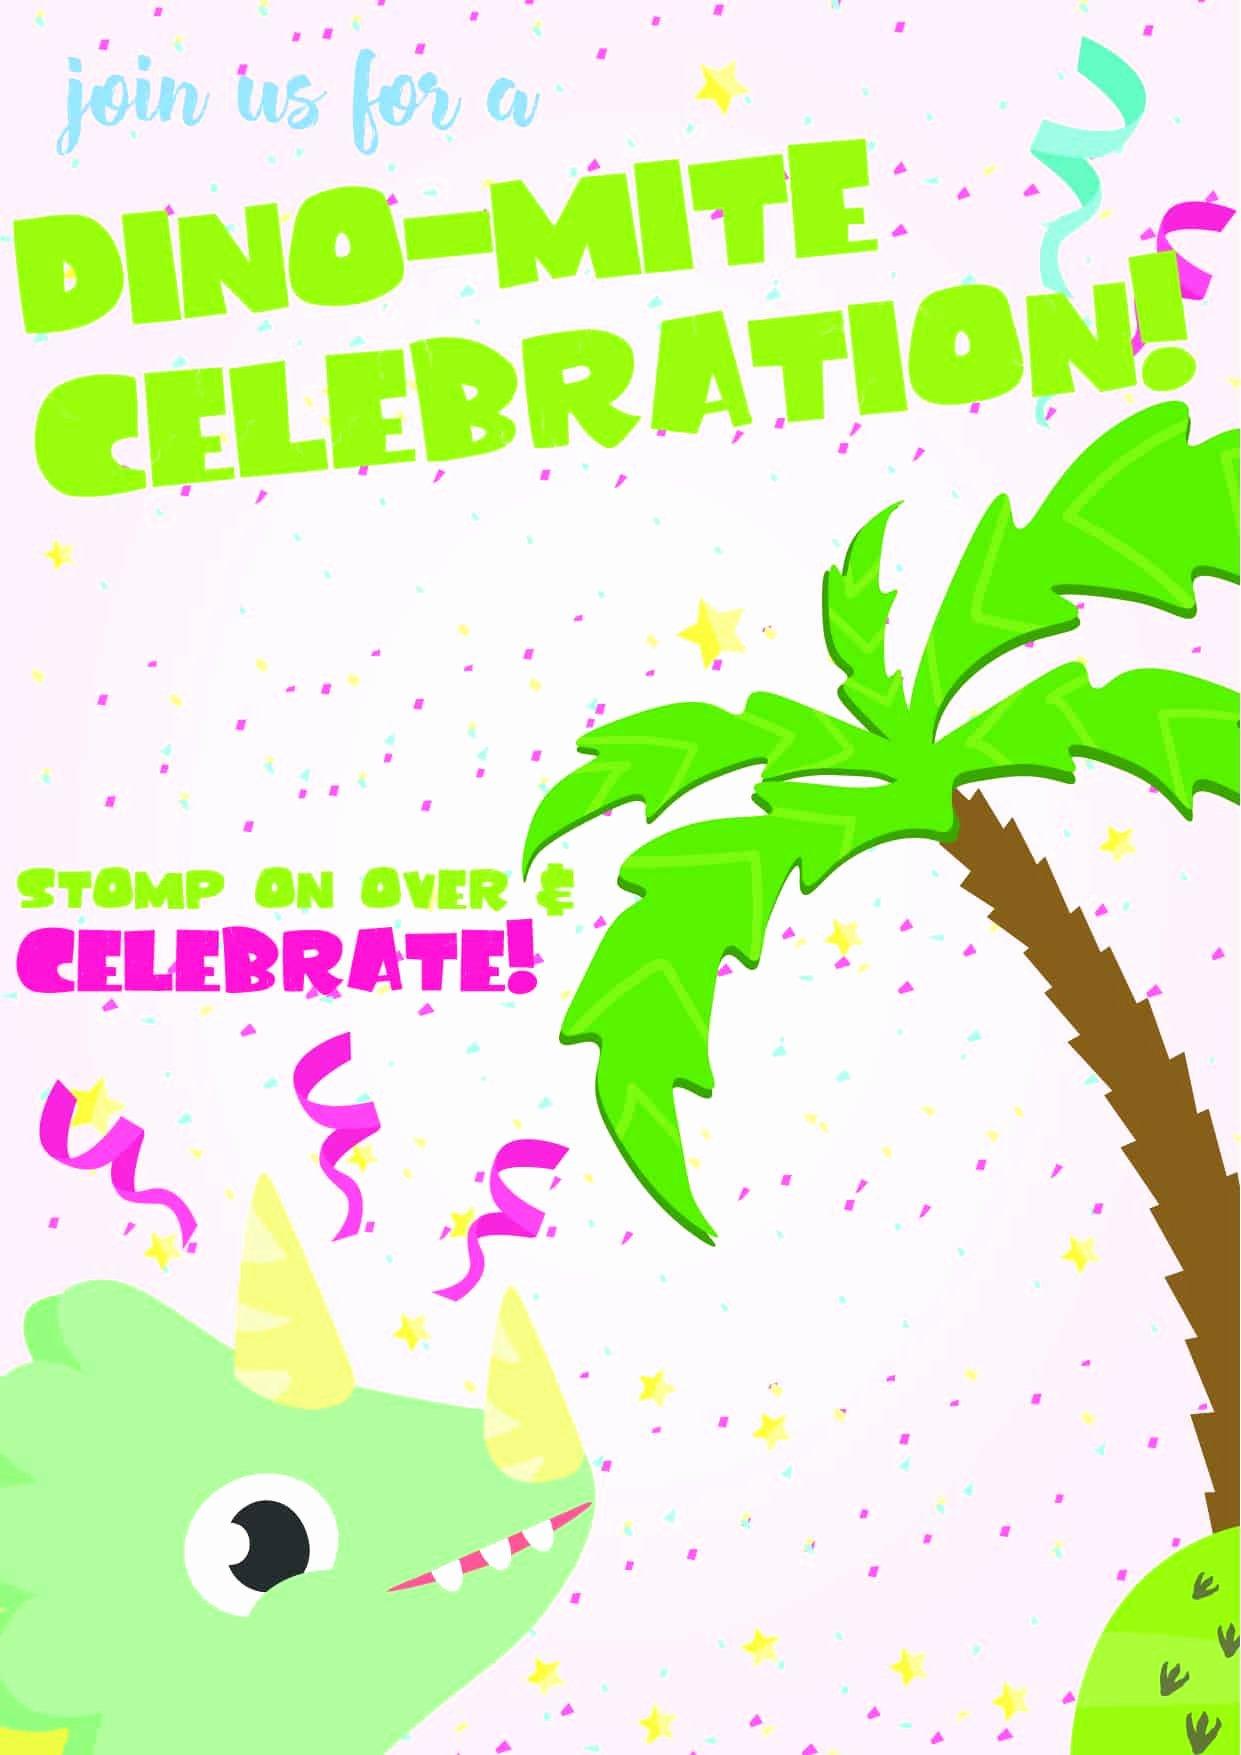 Free Printable Dinosaur Birthday Invitations Lovely Dinosaur Birthday Invitations Free Printable Party with Unicorns